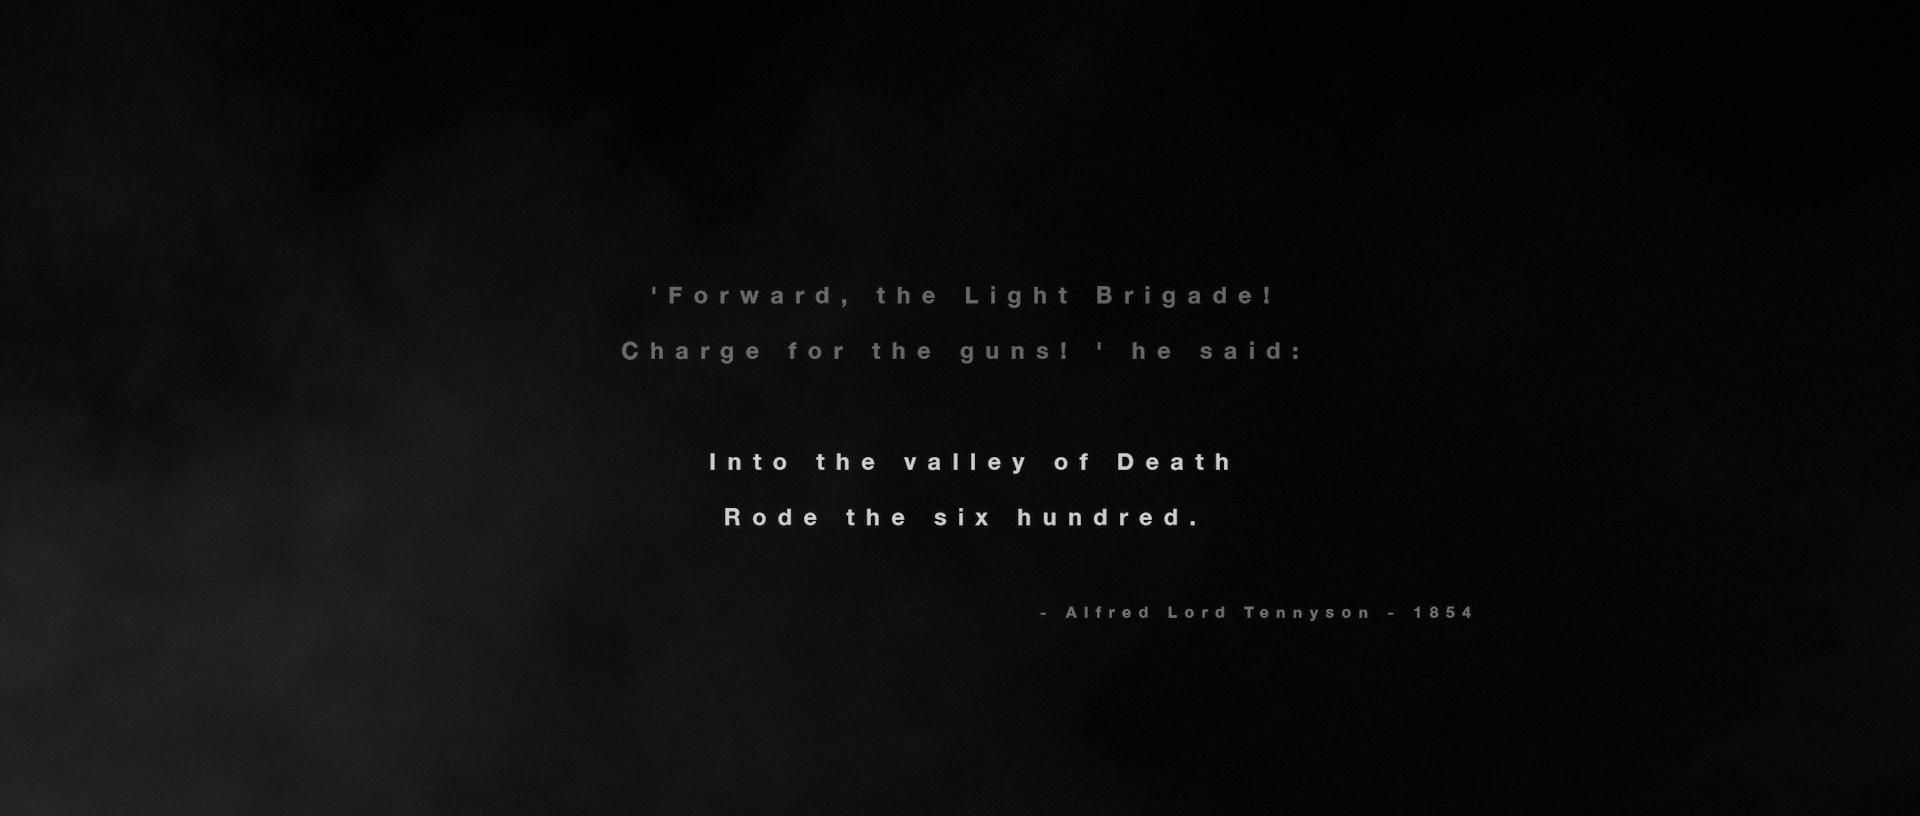 War_poem1.jpg